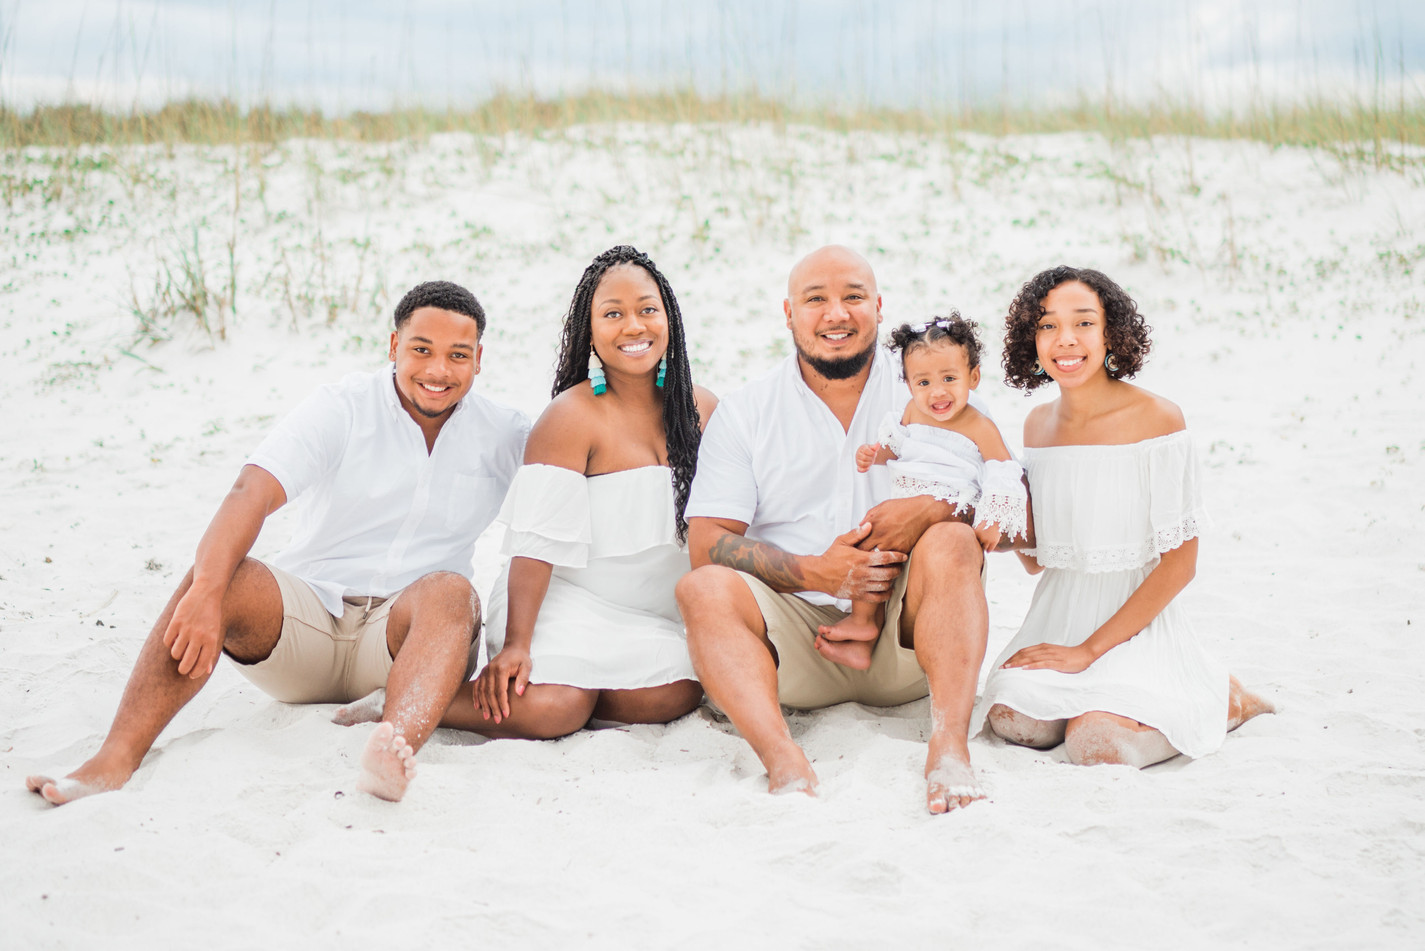 thereyesfamily-2.jpg